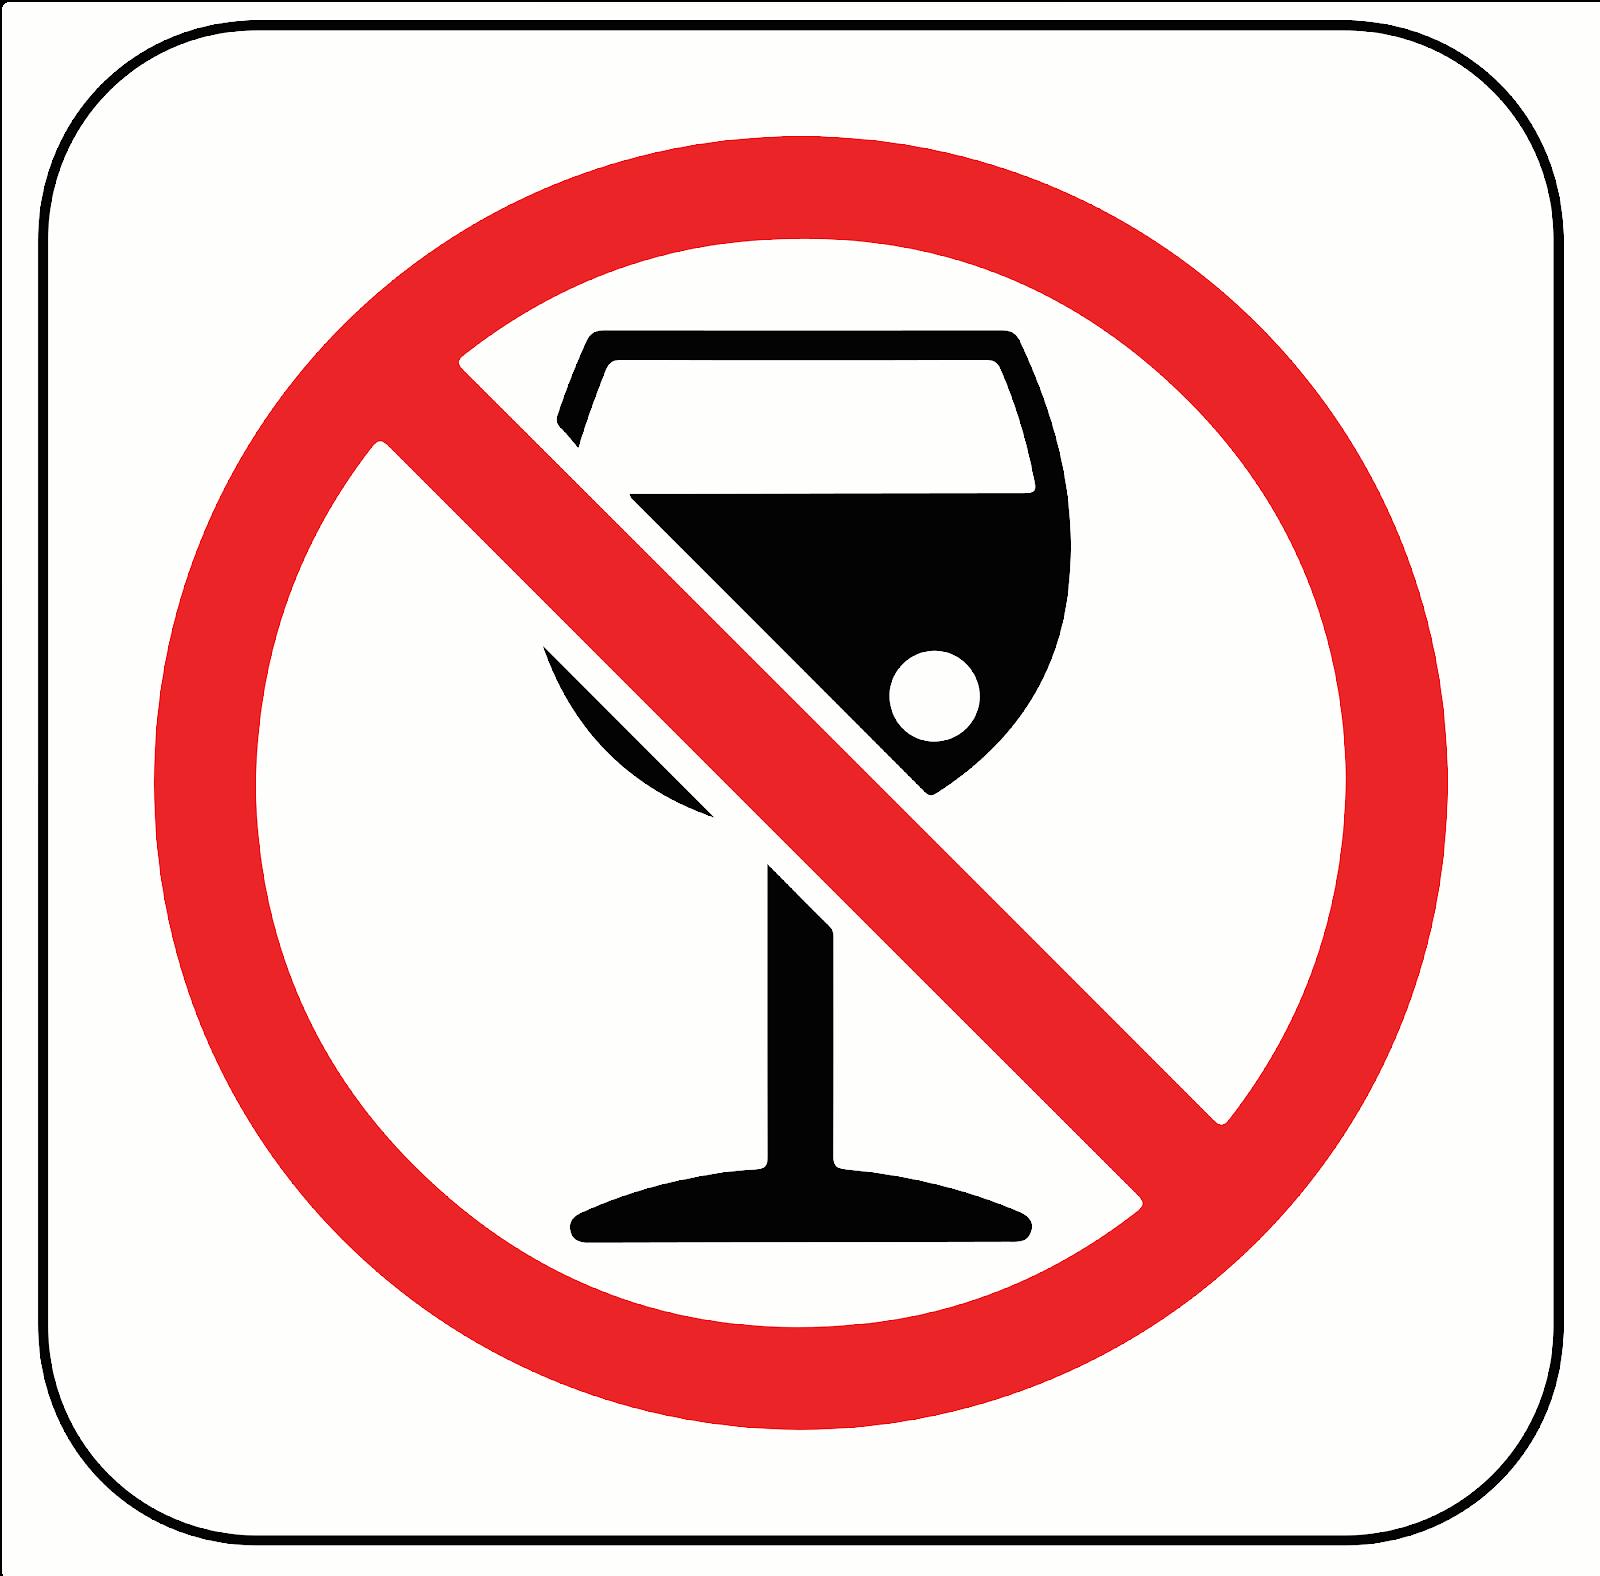 No_alcohol-1.svg.png